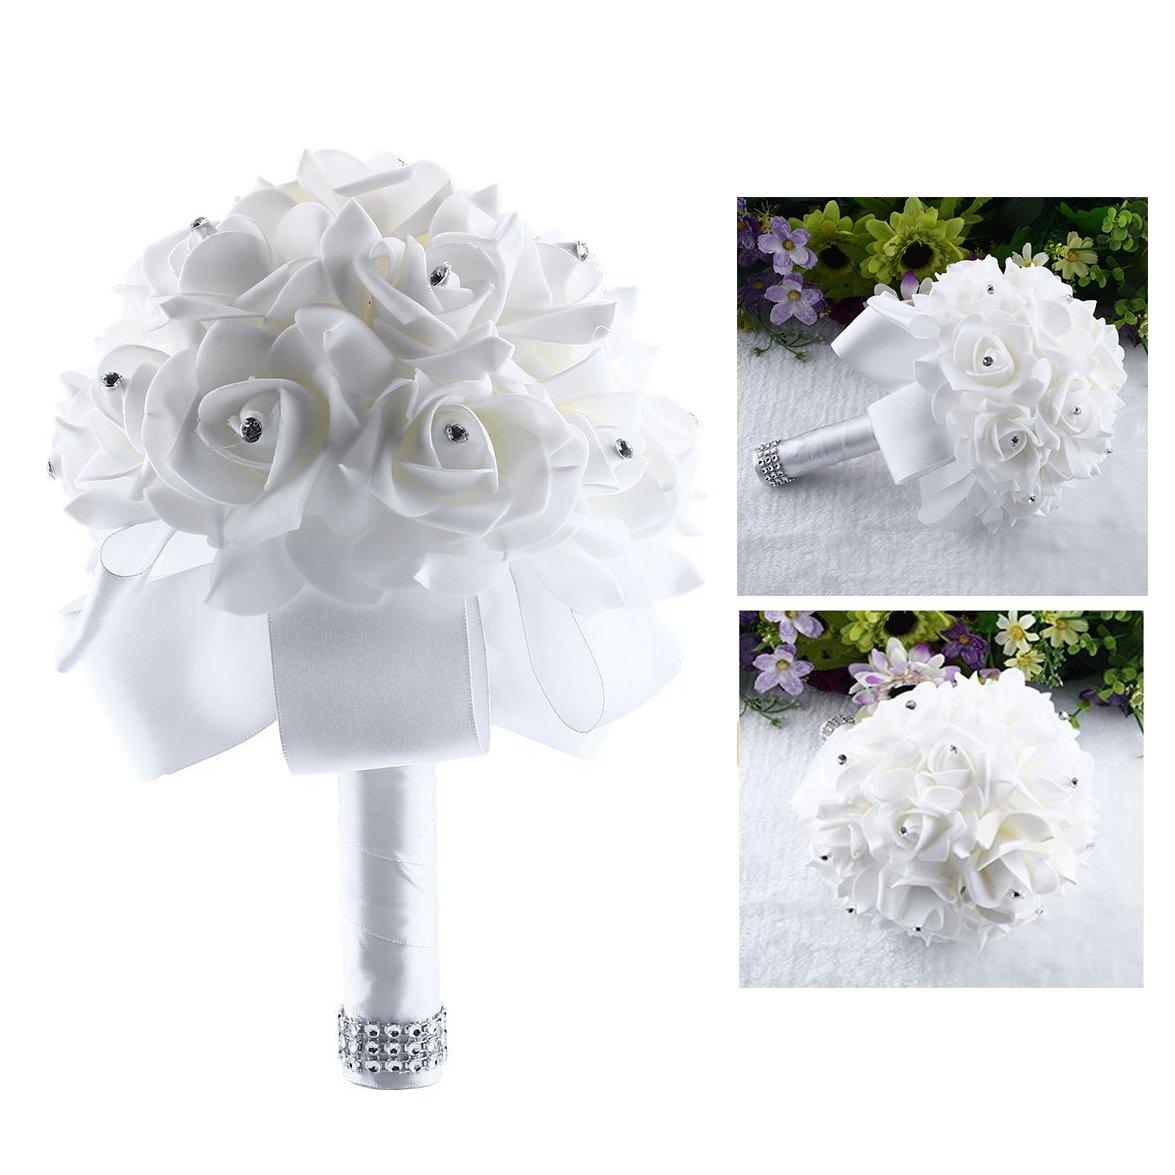 Itian Handmade Bouquet Of Roses Bride Bridesmaid Wedding Flower Pure Satin Beautiful Flowers Artificial Flowers